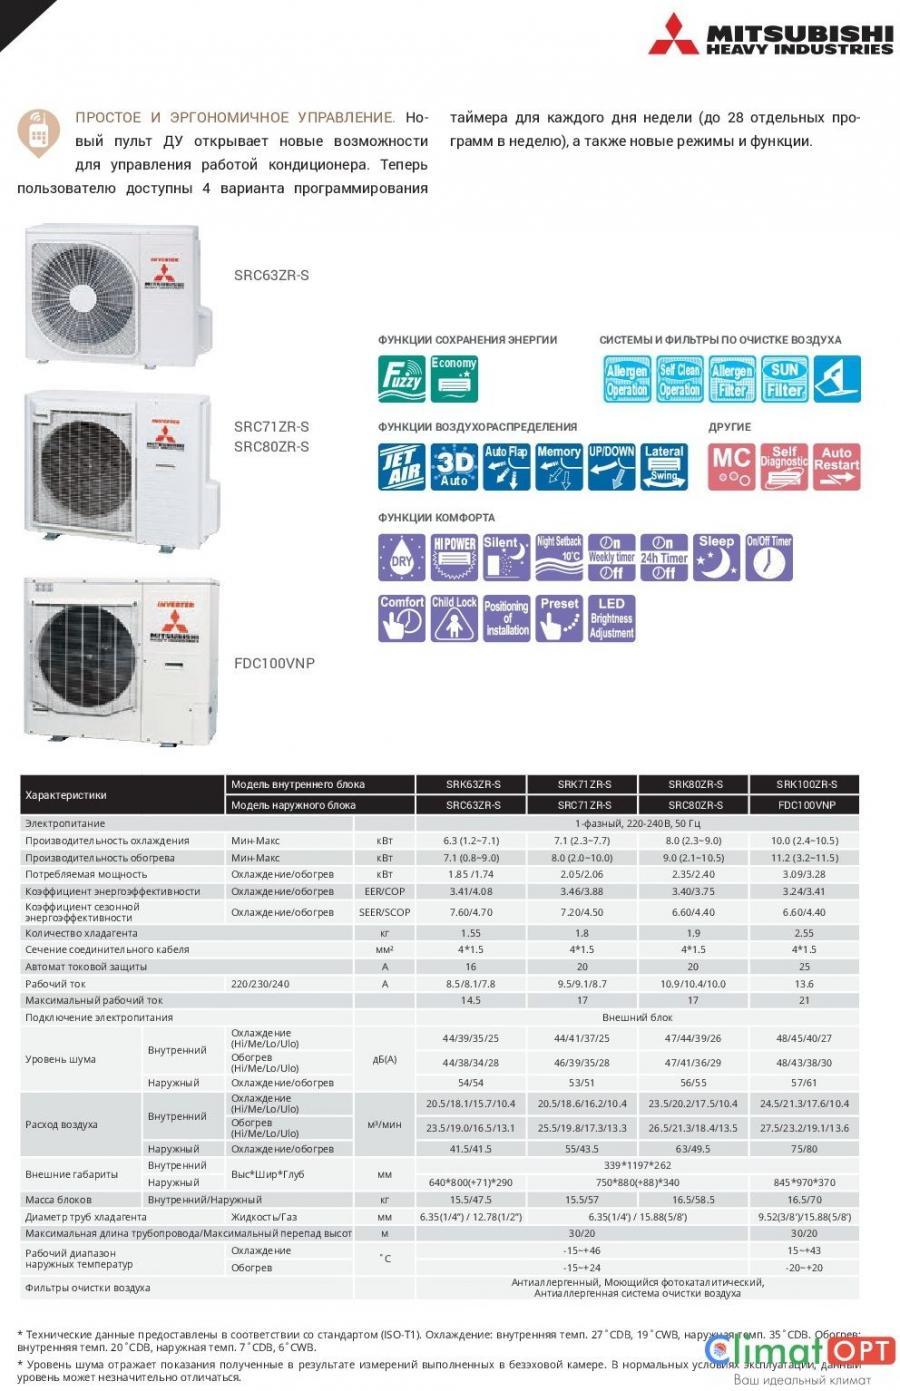 Mitsubishi Heavy Industries SRK-ZR-S Inverter (Звоните, Скидки!)